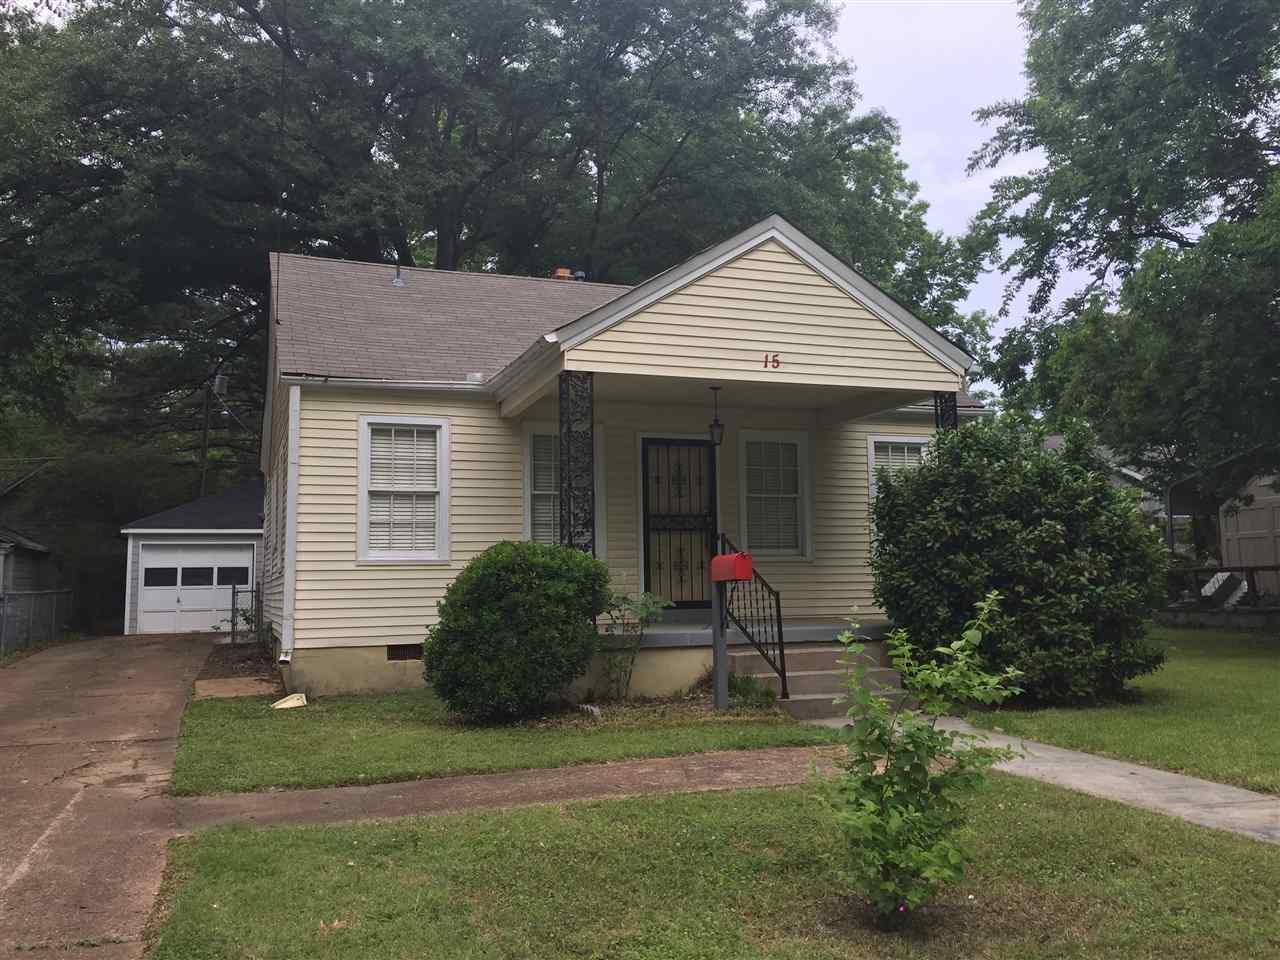 15 S Merton, Memphis, TN 38112